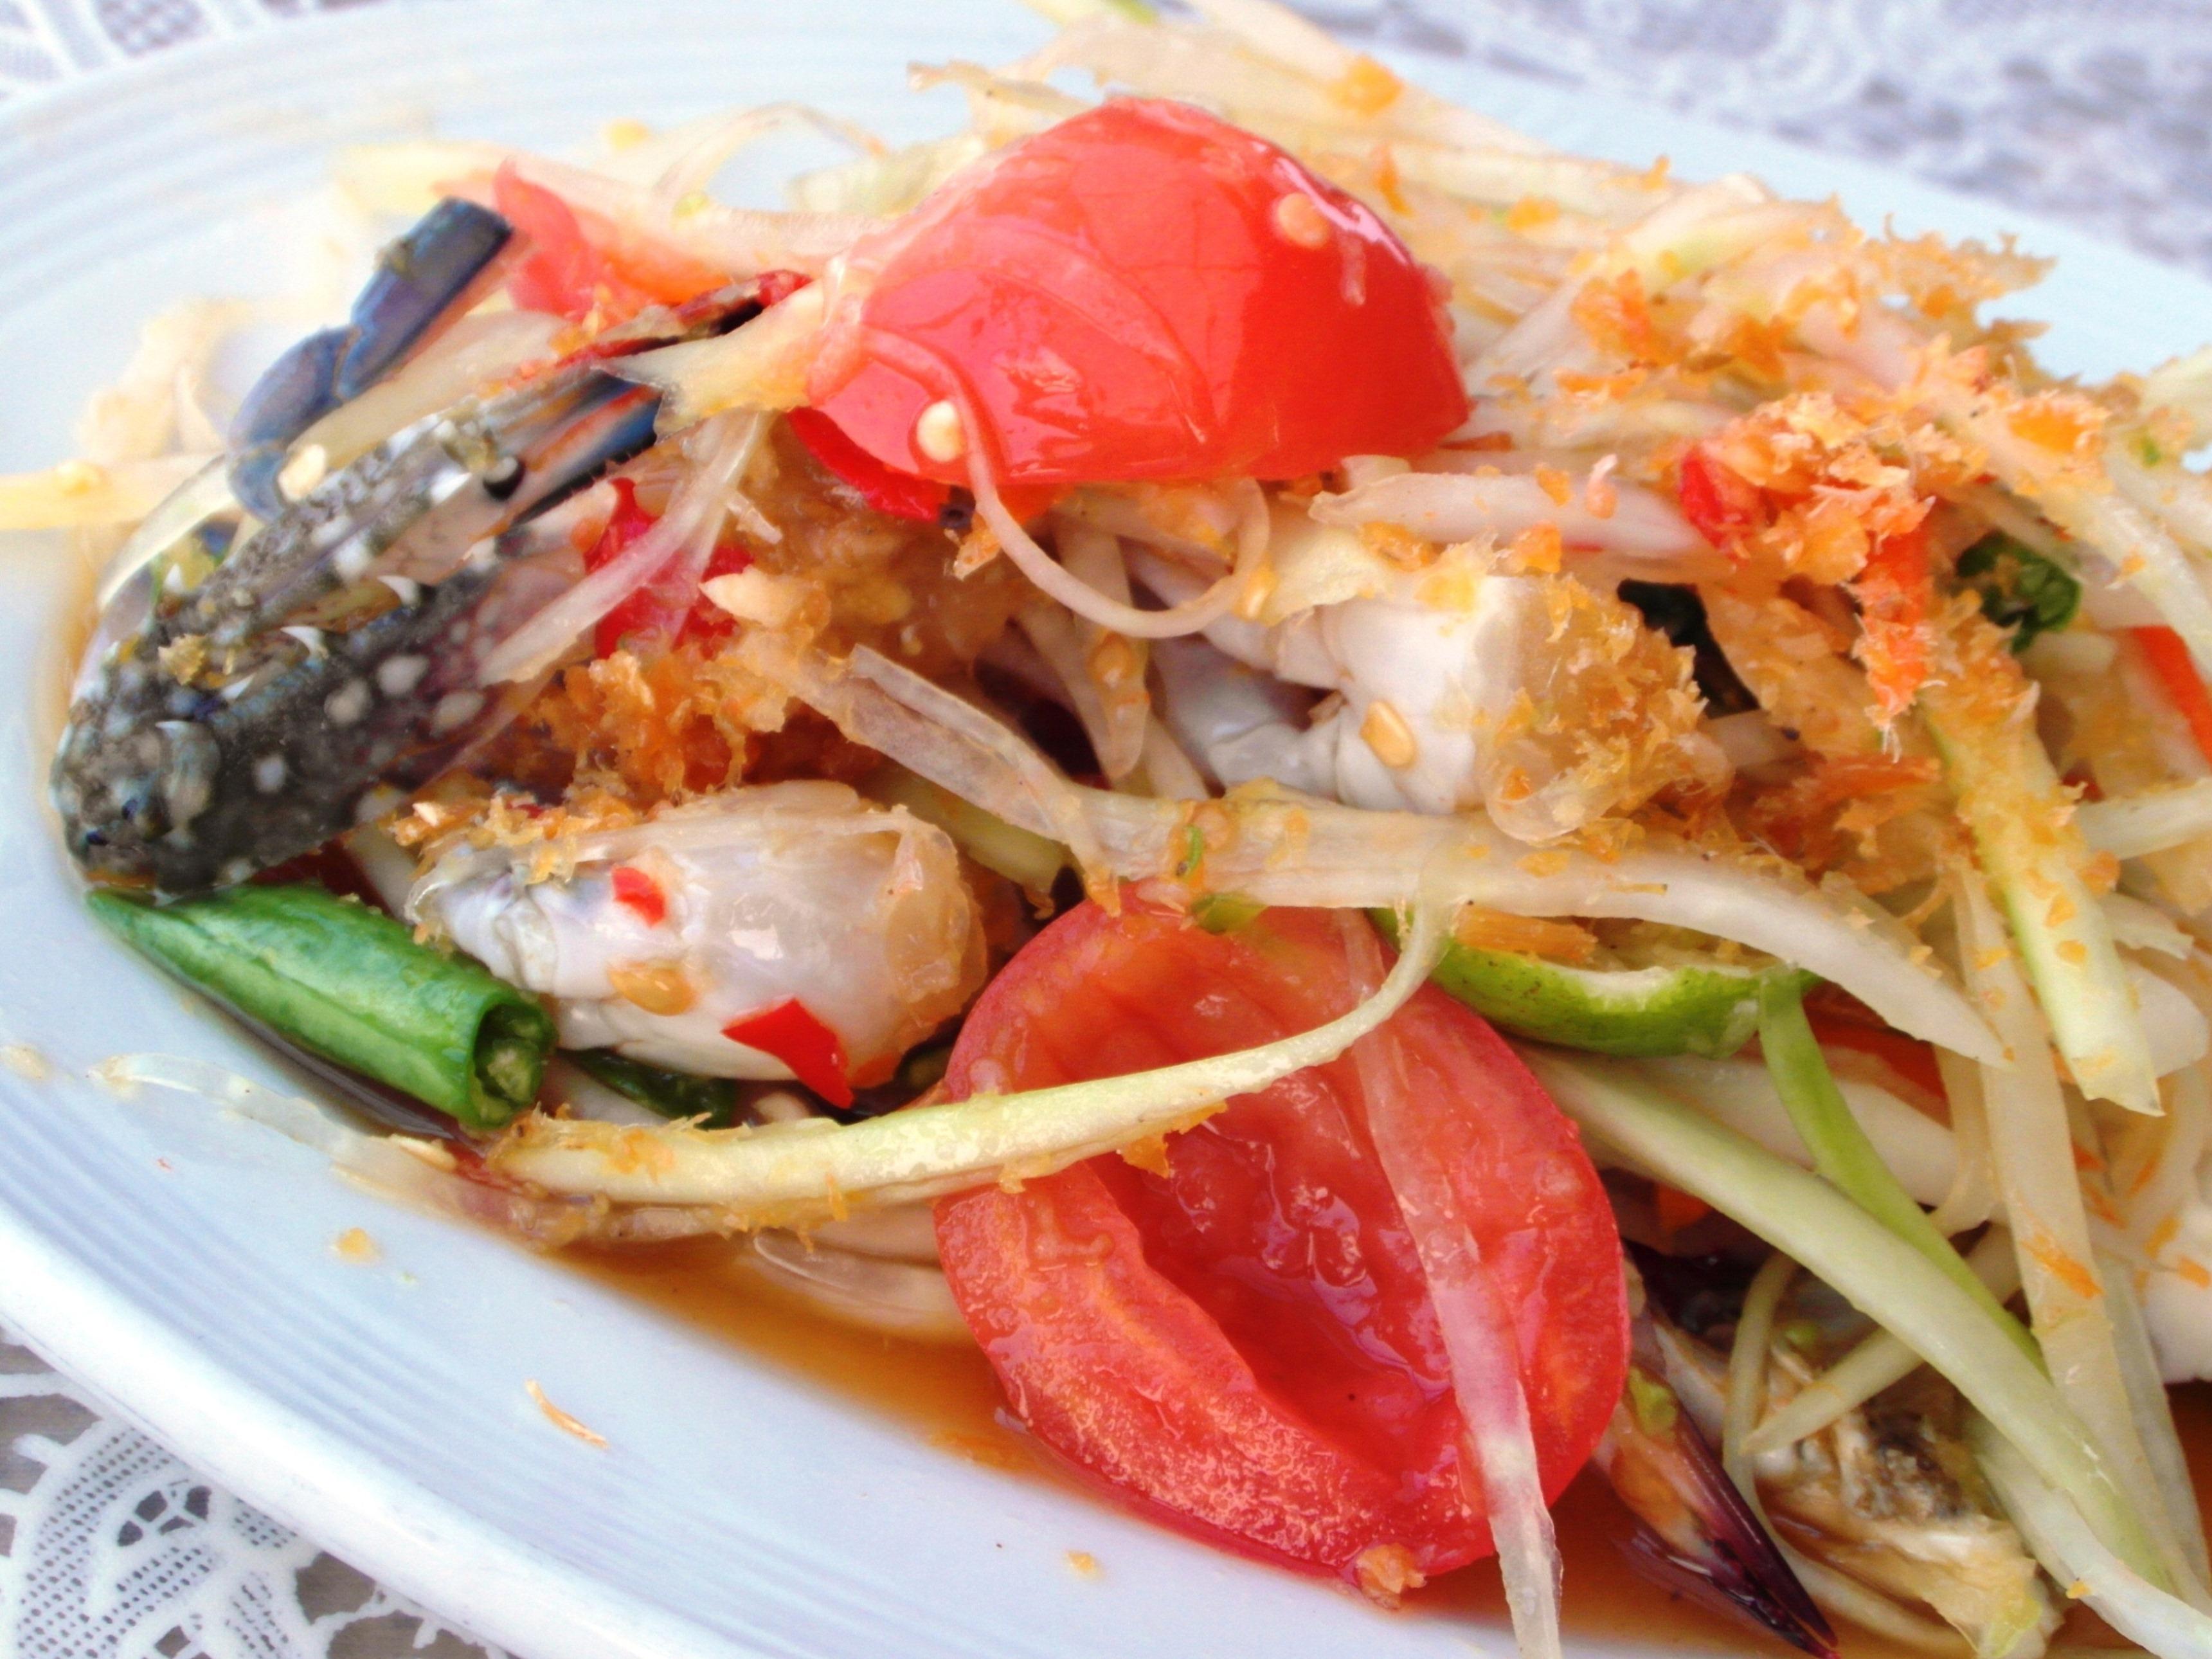 Spicy Crab Salad, Asia, Oriental, Vegetables, Tomato, HQ Photo